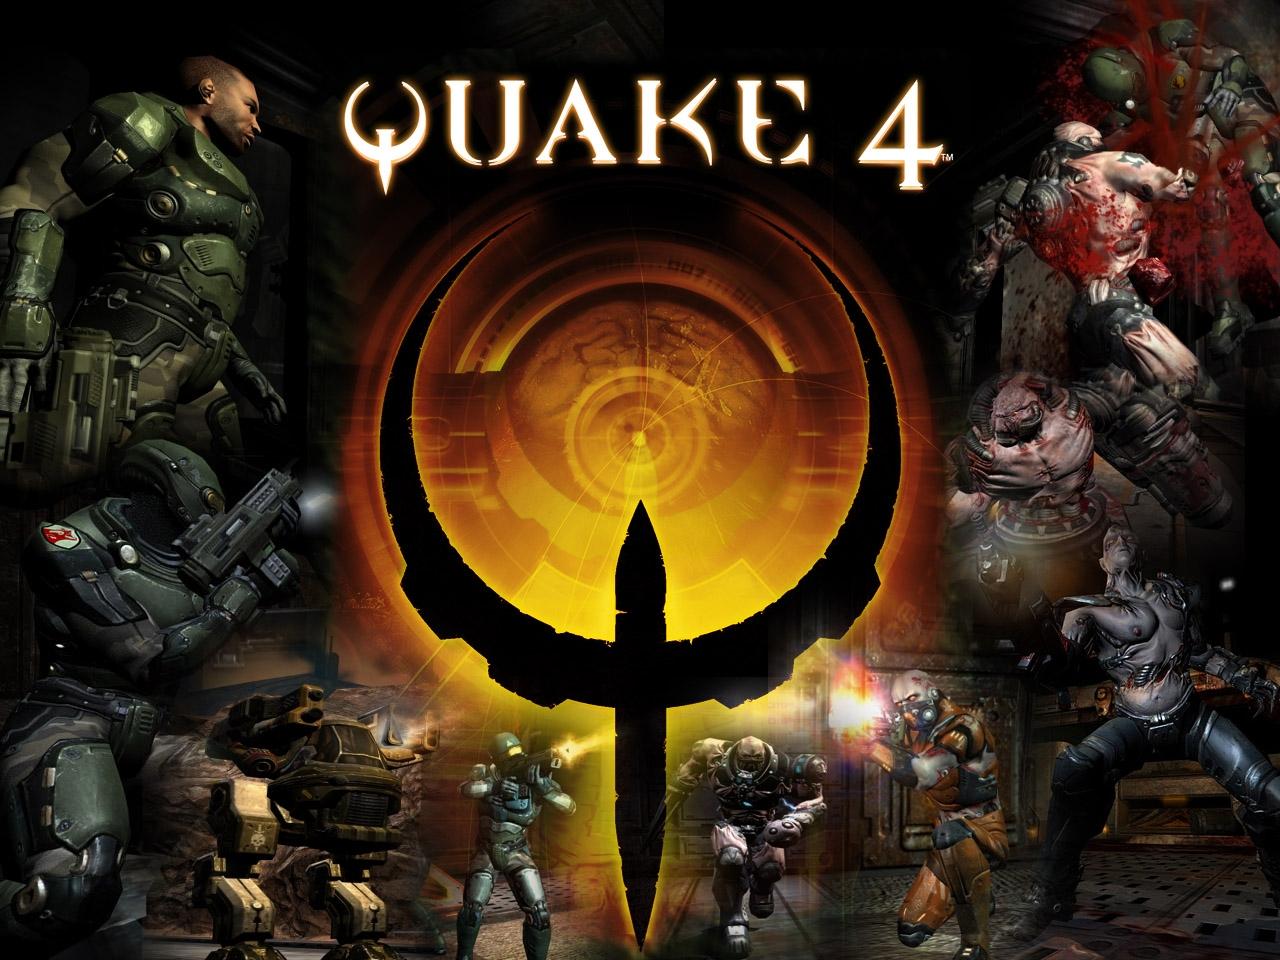 Quake 4 Wallpaper 2 1280x960